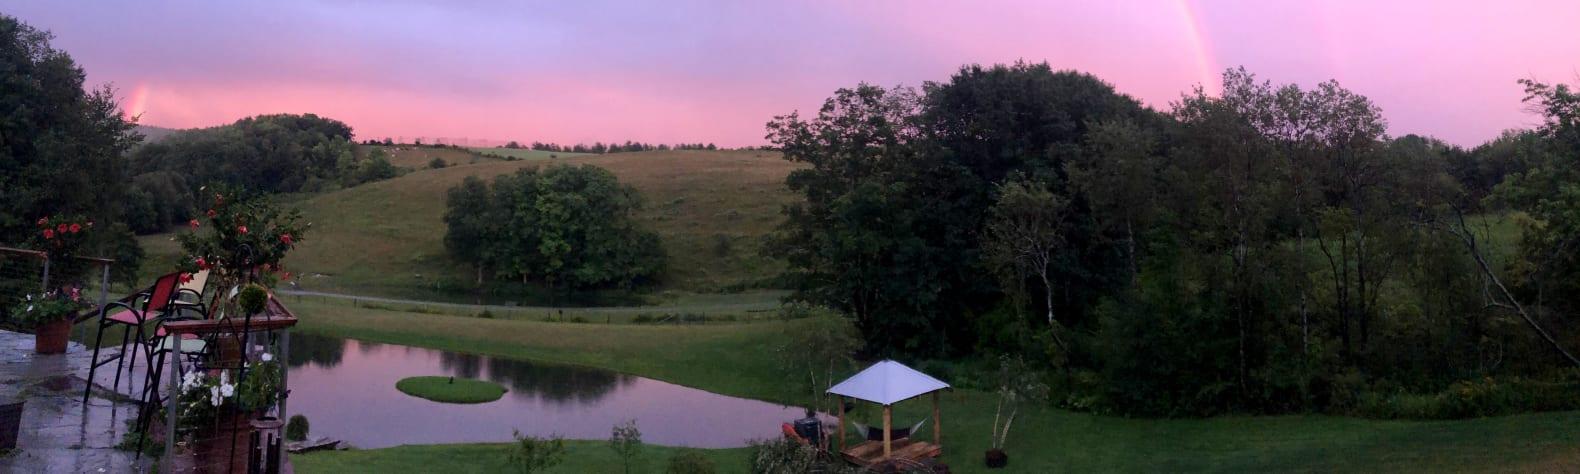 ~ Slateville Farm & Trails ~